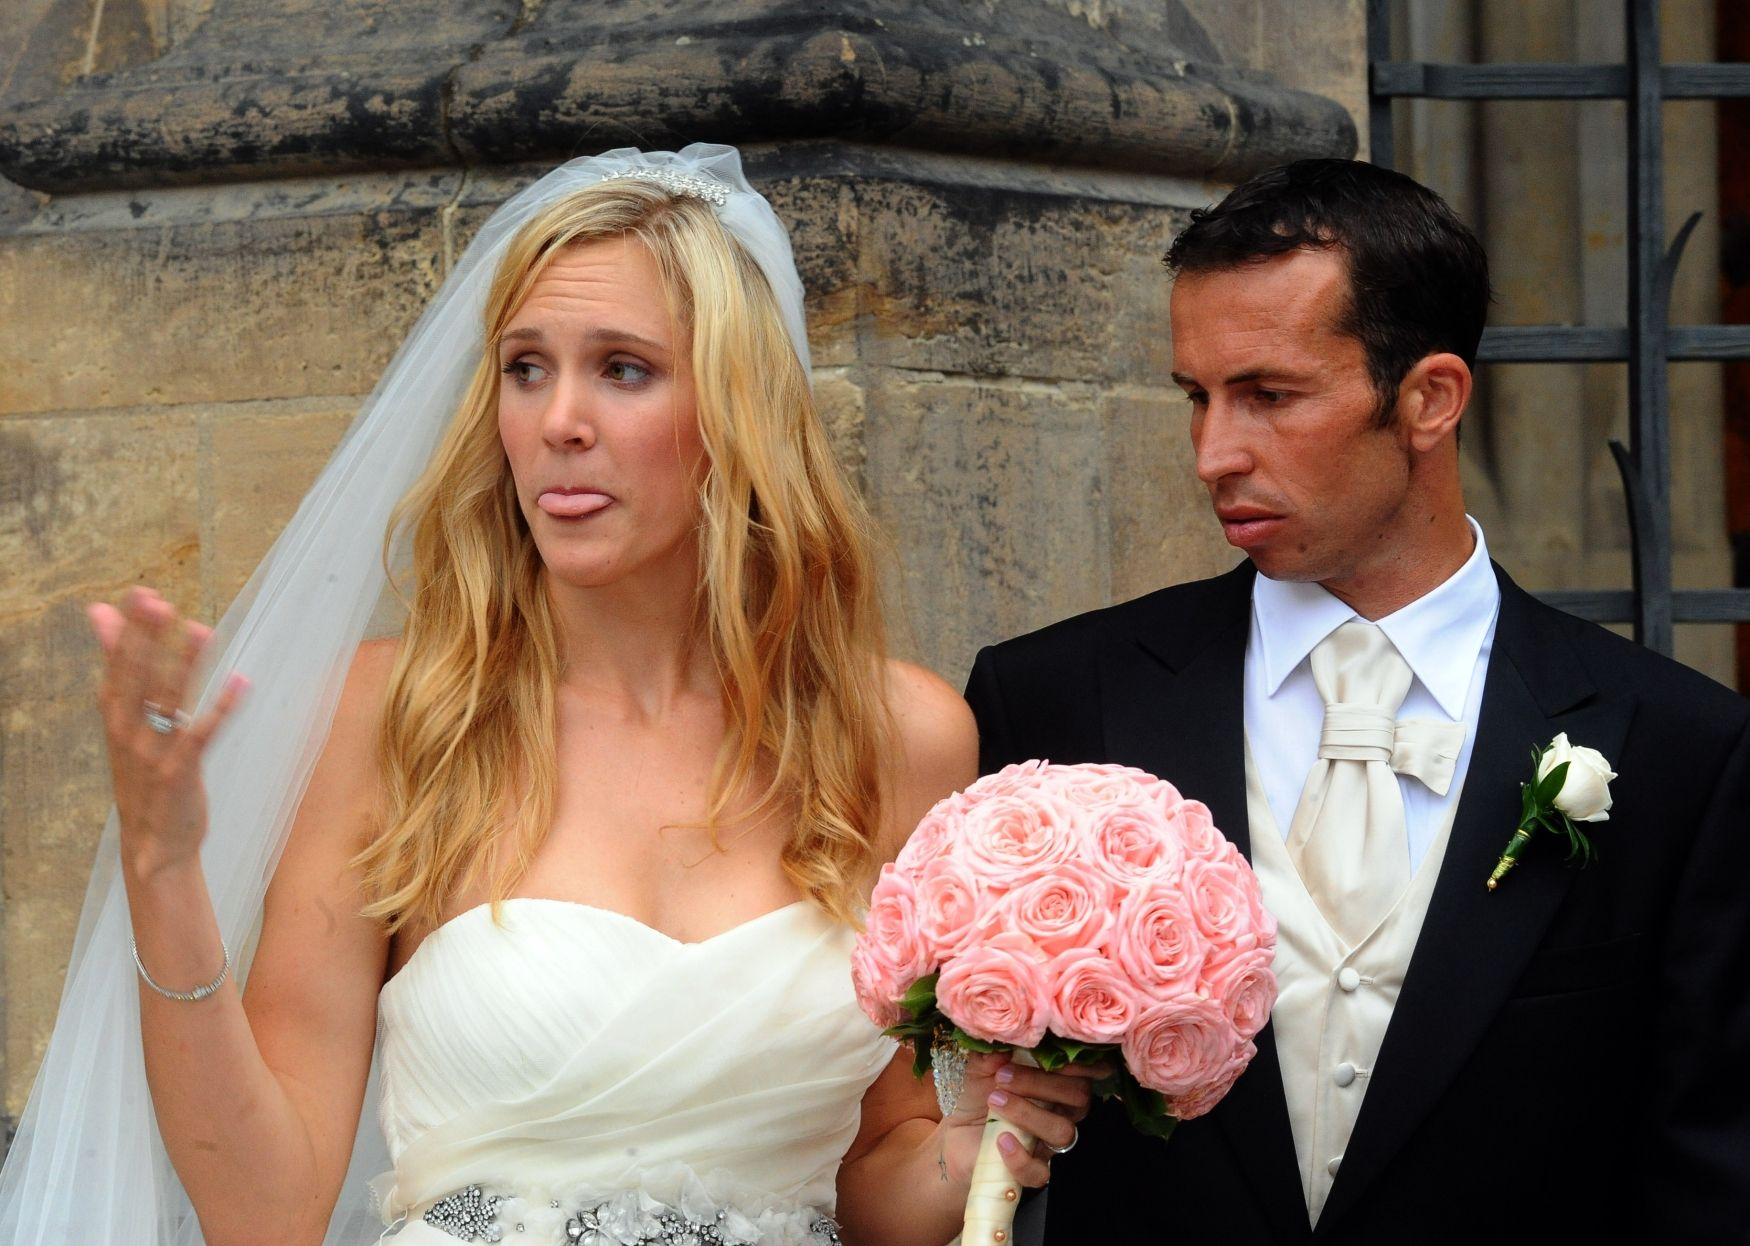 Rory nicol wedding